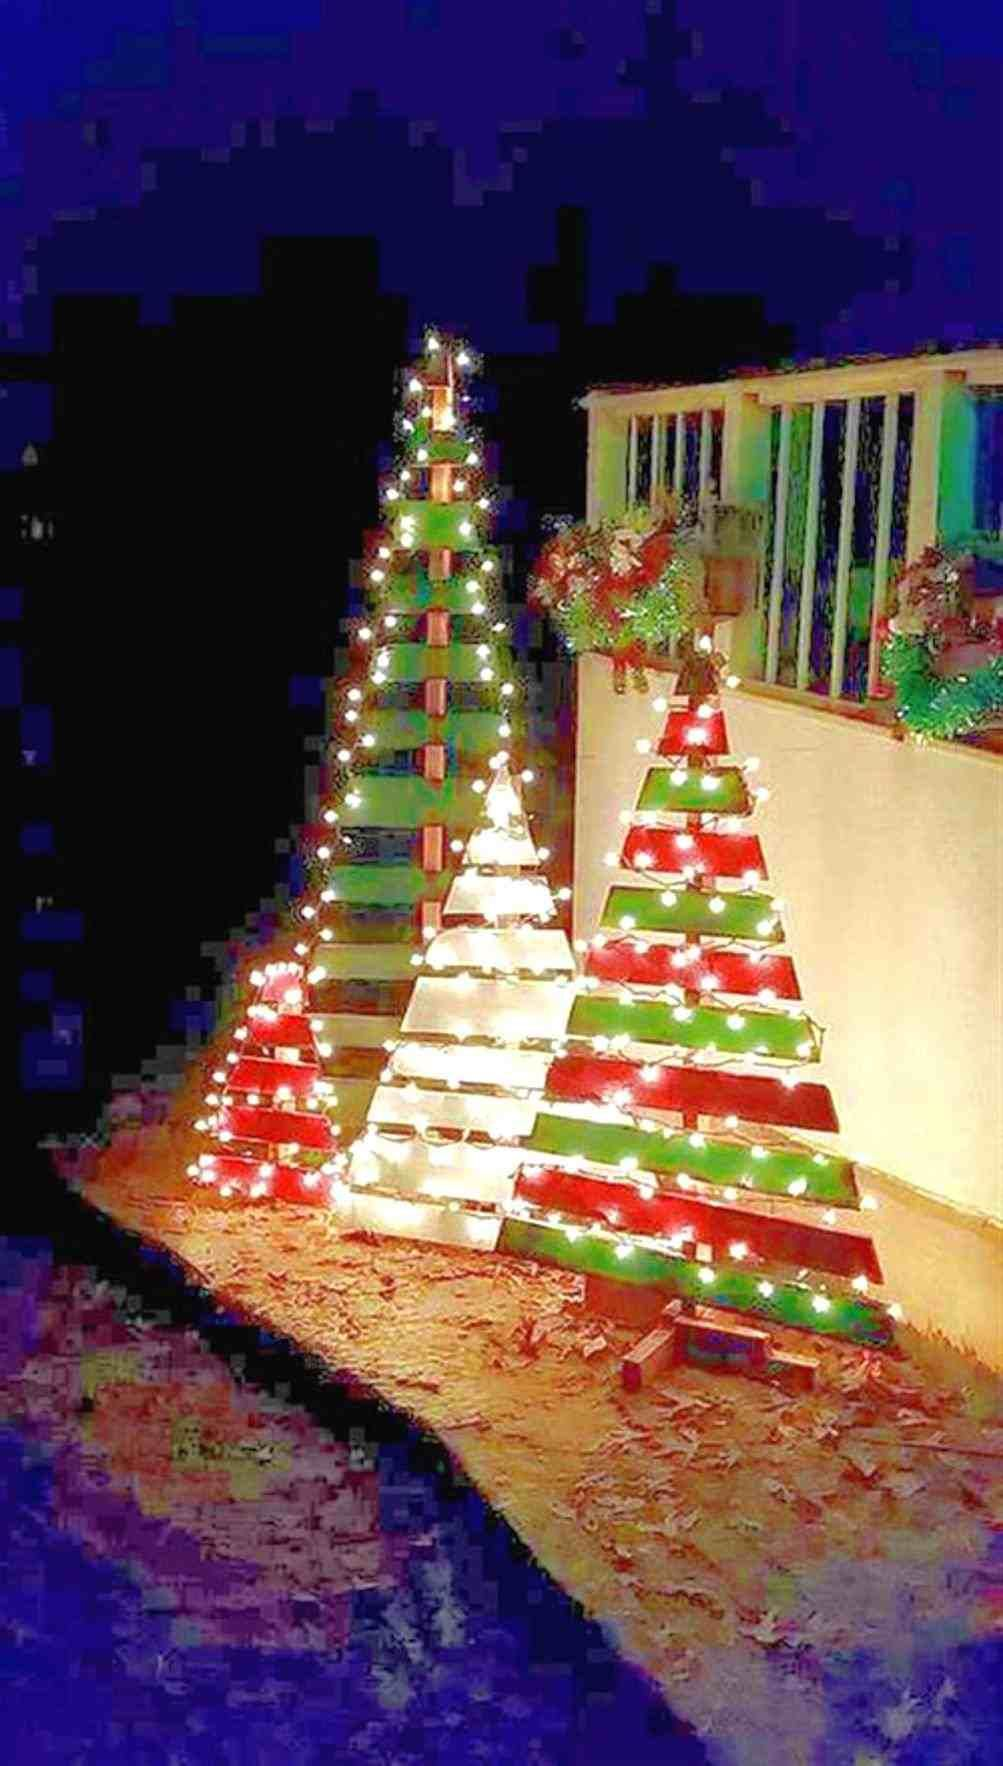 Bobayule Com Bobayule On Budget Ideas Christmas Lawn Decorations Christmas Decorating Hacks Pallet Christmas Tree